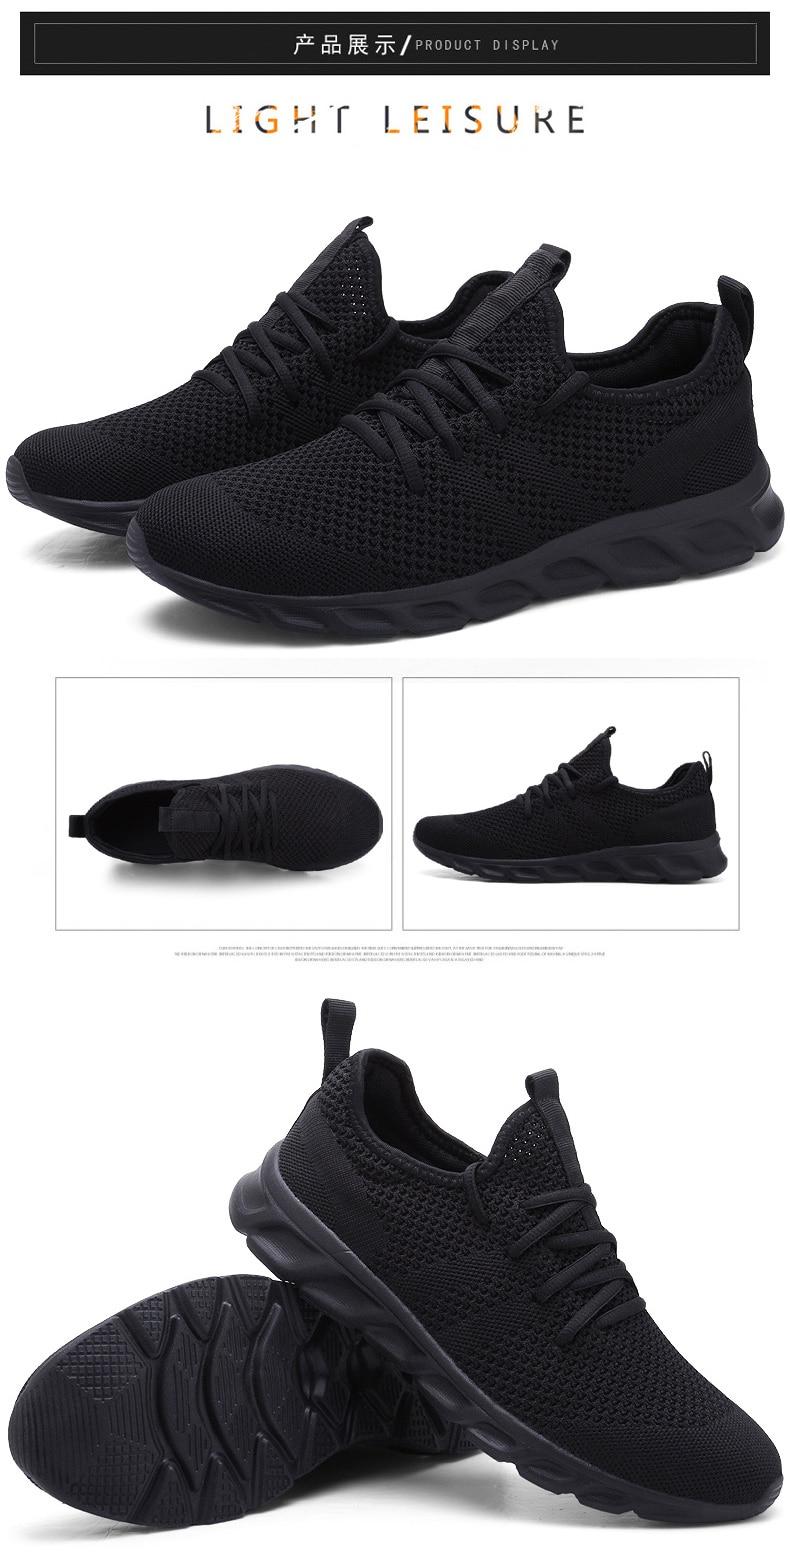 H9e252d112f9b434e9d3ccf0990e7ea81b Flyknit Men Shoes Light Sneakers Men Breathable Jogging Shoes for Men Rubber Tenis Masculino Adulto Plus 35 46 48